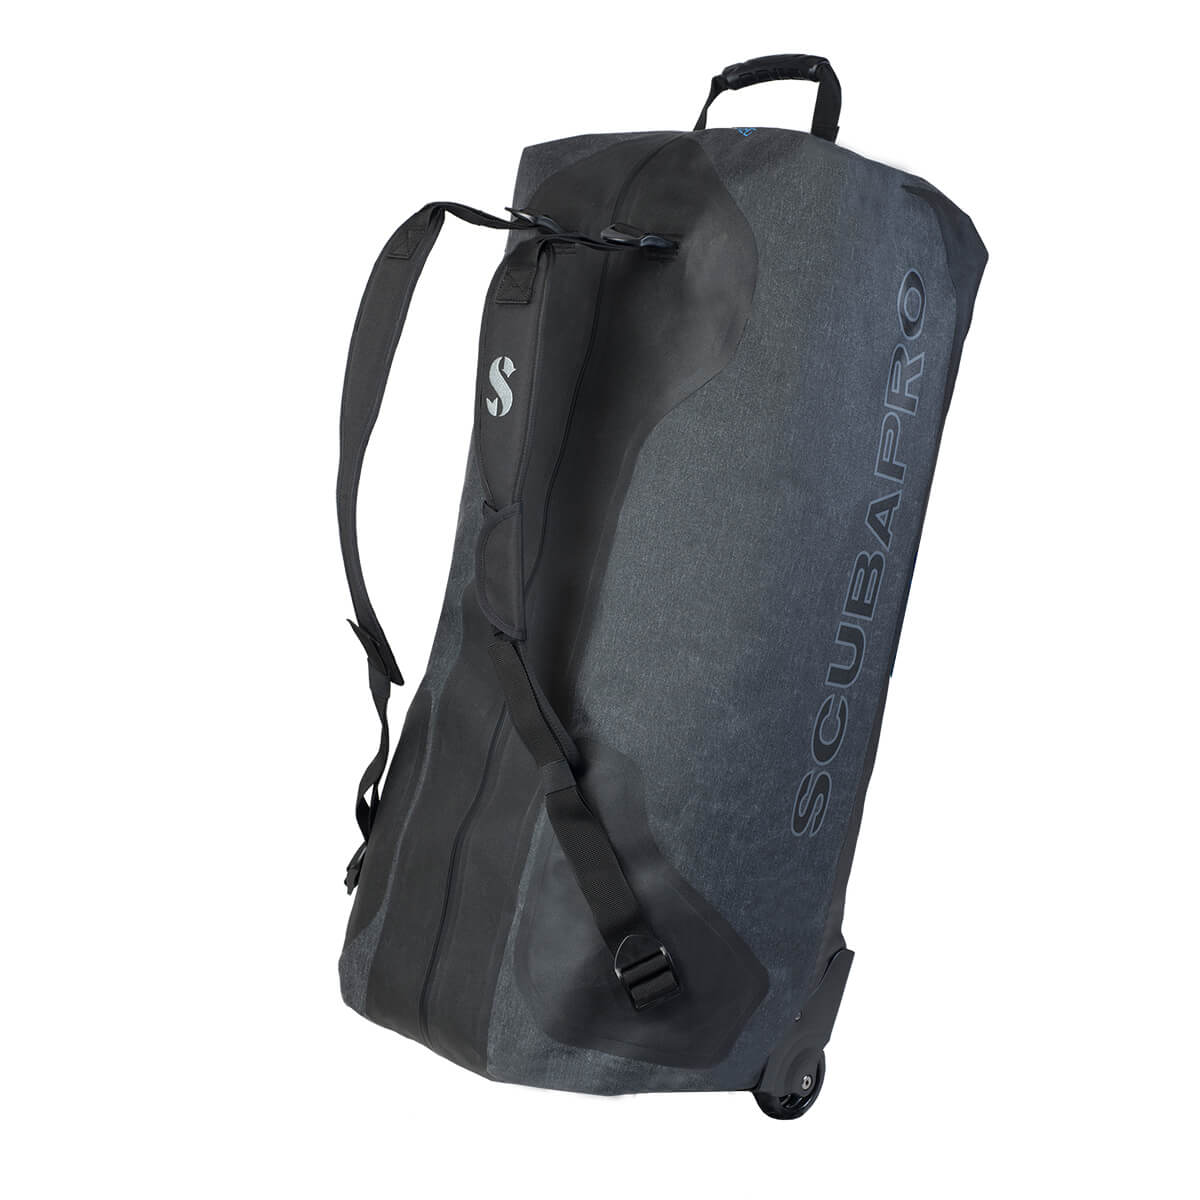 SCUBAPRO - Dry Bag 120 Liter mit Rollen